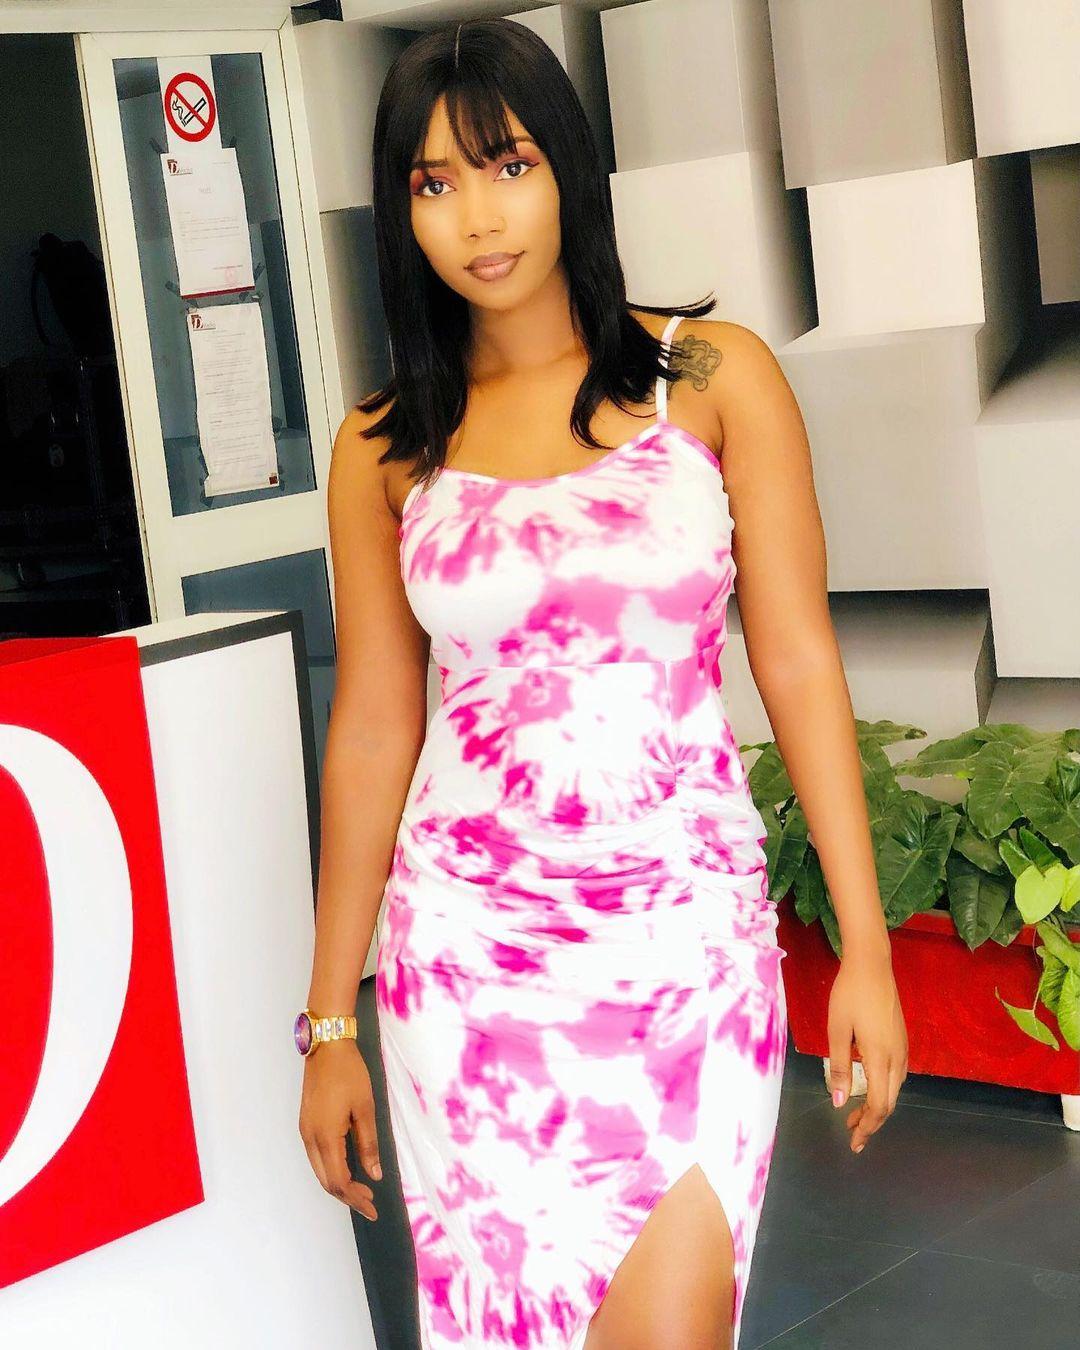 Photos – Nana Aïdara gâte ses fans avec des clichés ultra sensuels